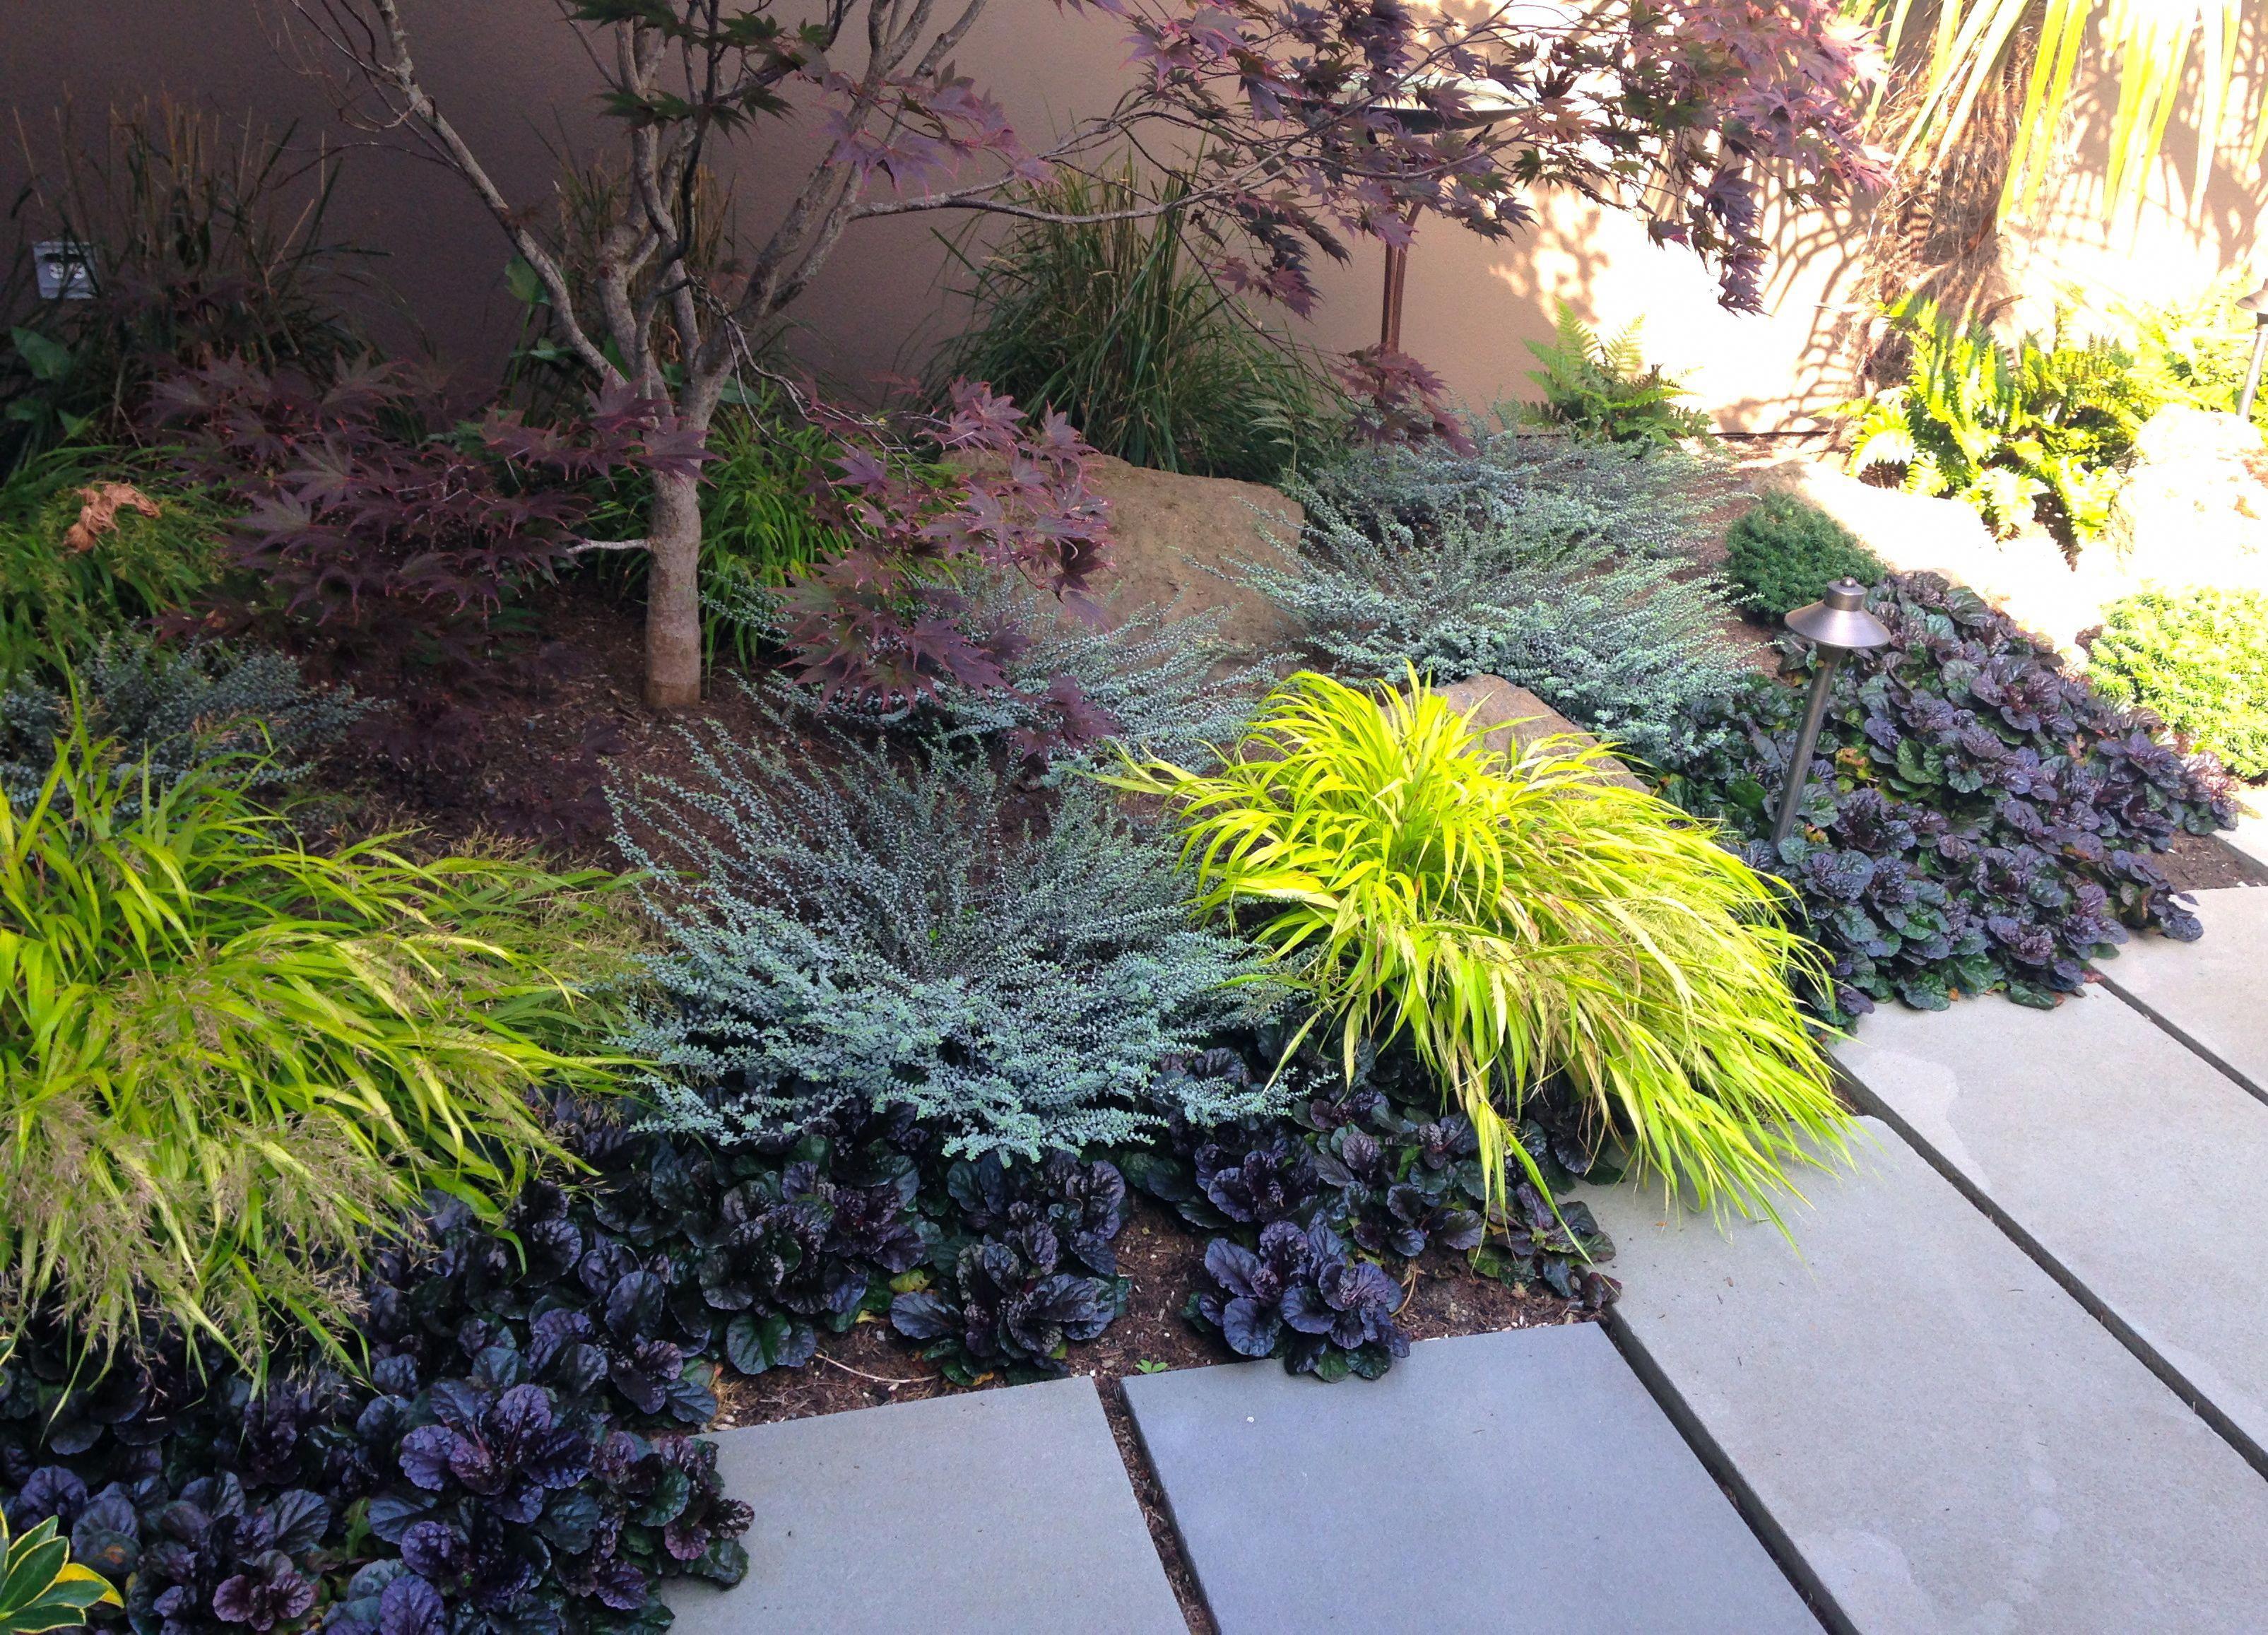 Landscape Gardening For Small Gardens Landscape Gardening ...